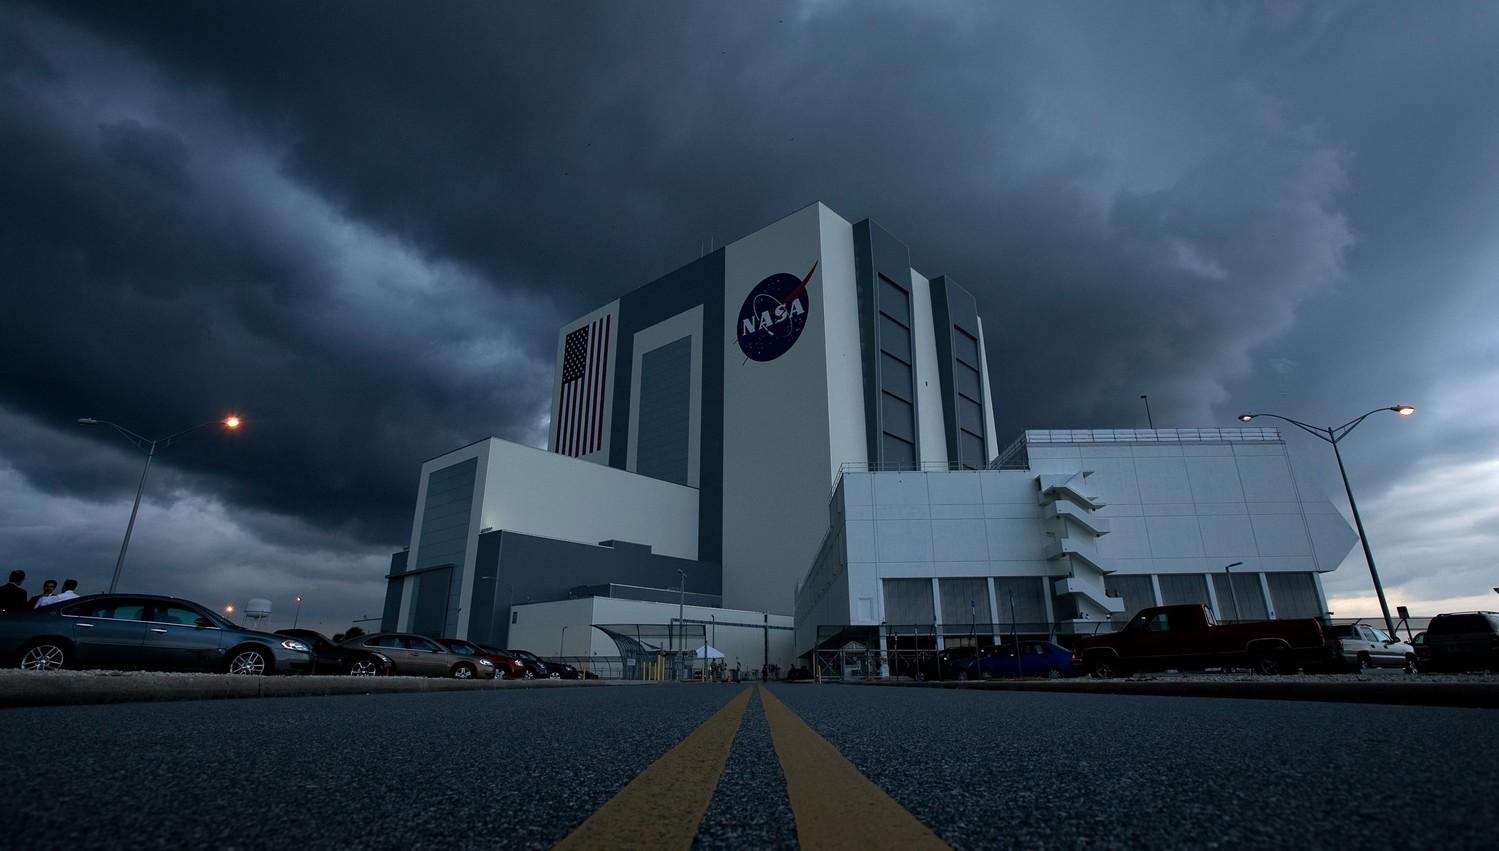 В НАСА объявили о создании лекарства от старости